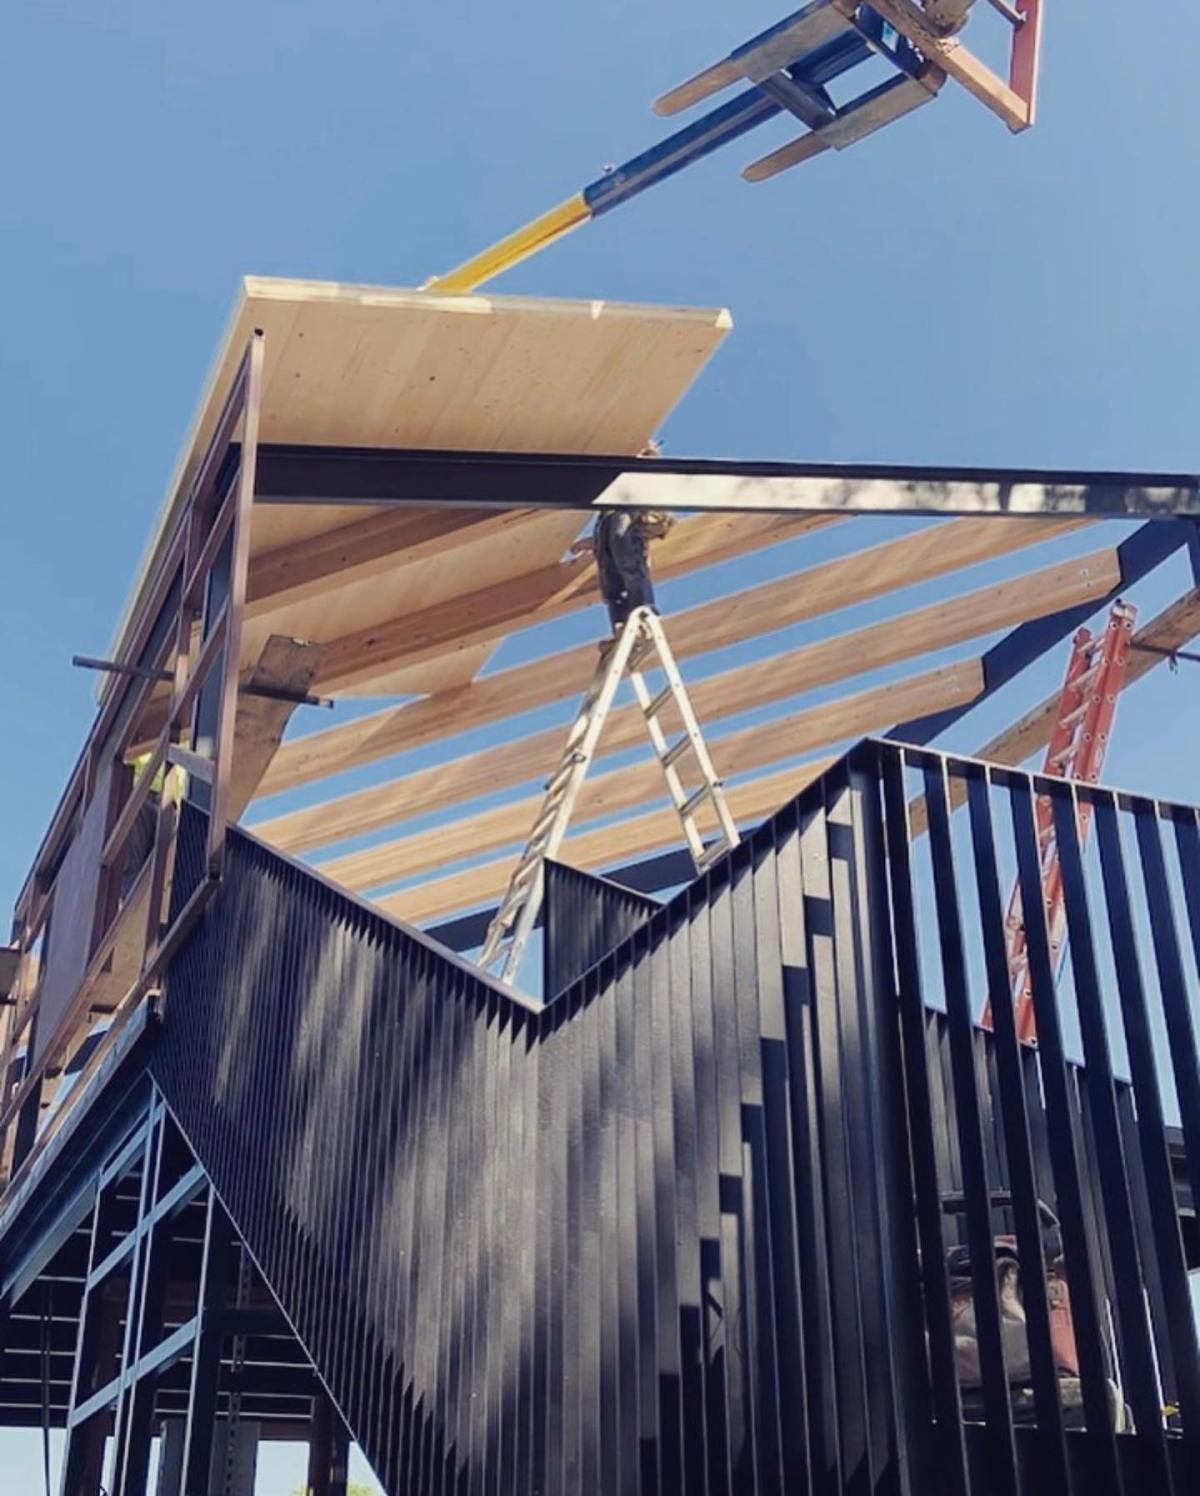 CLT frame installation on our Lake Austin boat dock. Designed by @breckstudio